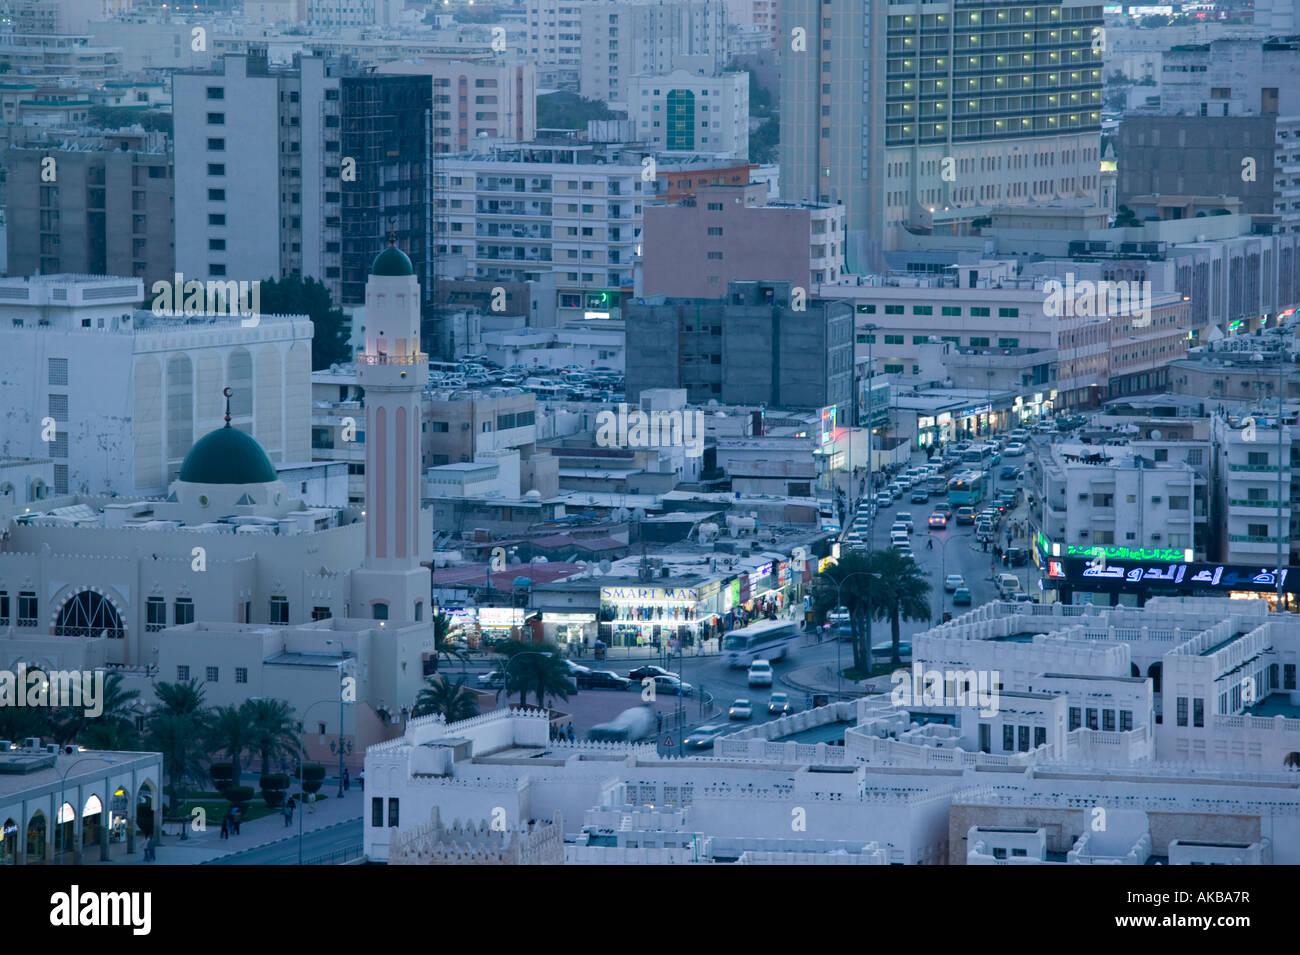 Qatar, Doha, Aerial View of Ali bin Abdullah Street - Stock Image